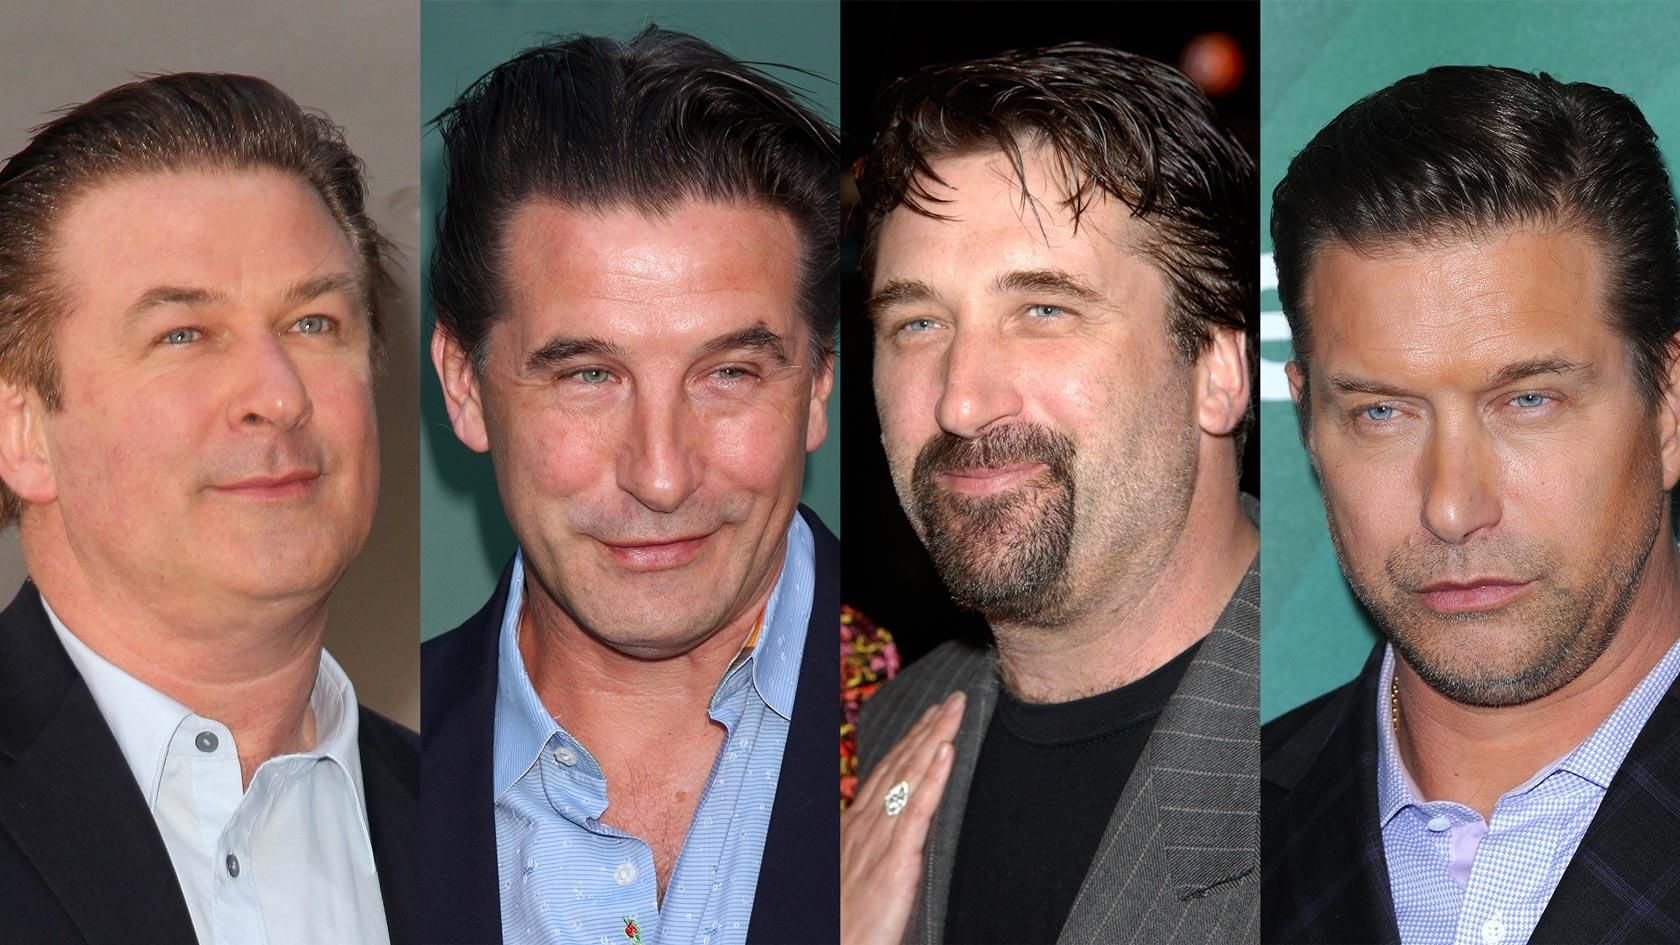 Baldwin Brothers: Alec, Daniel, William and Stephen. Acting dynasties 37